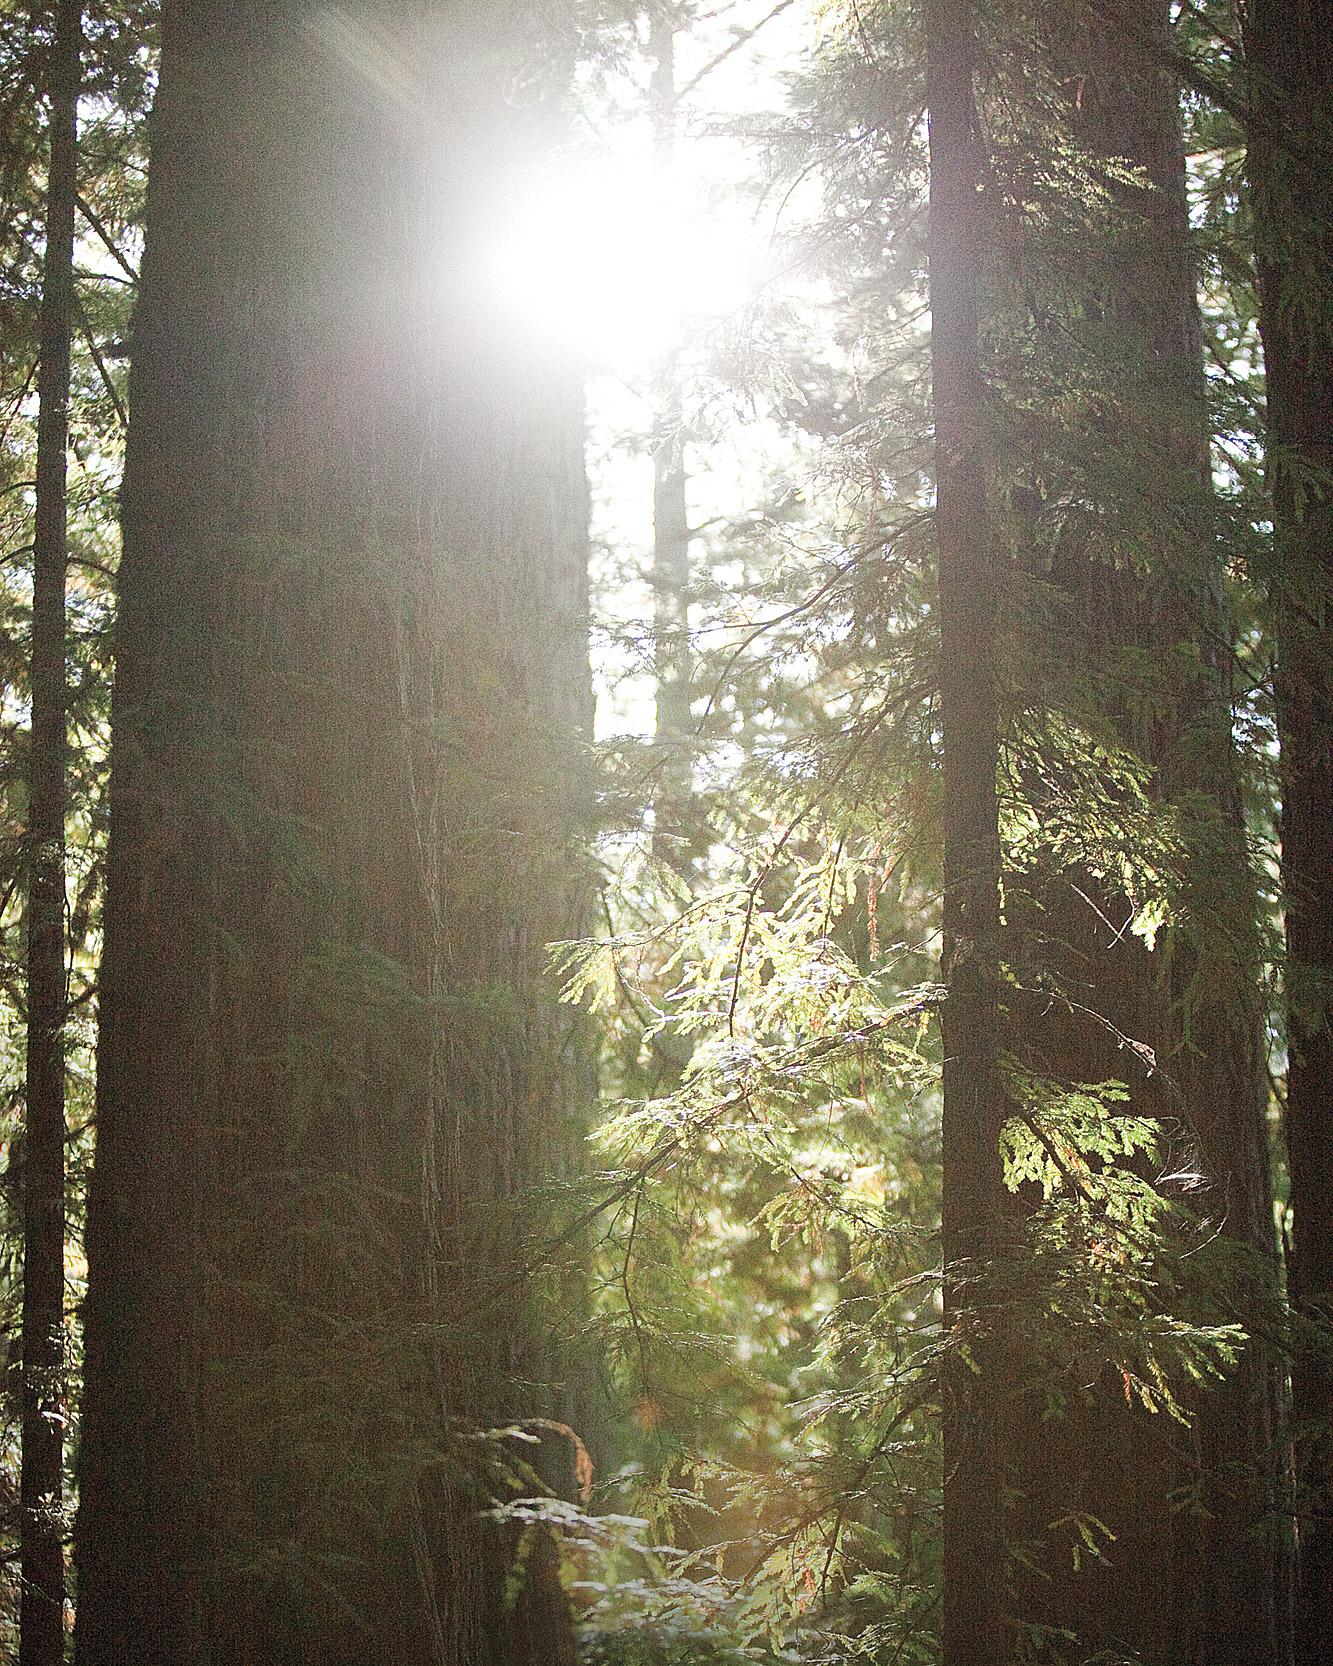 rw-laura-justin-red-woods-ms107644.jpg